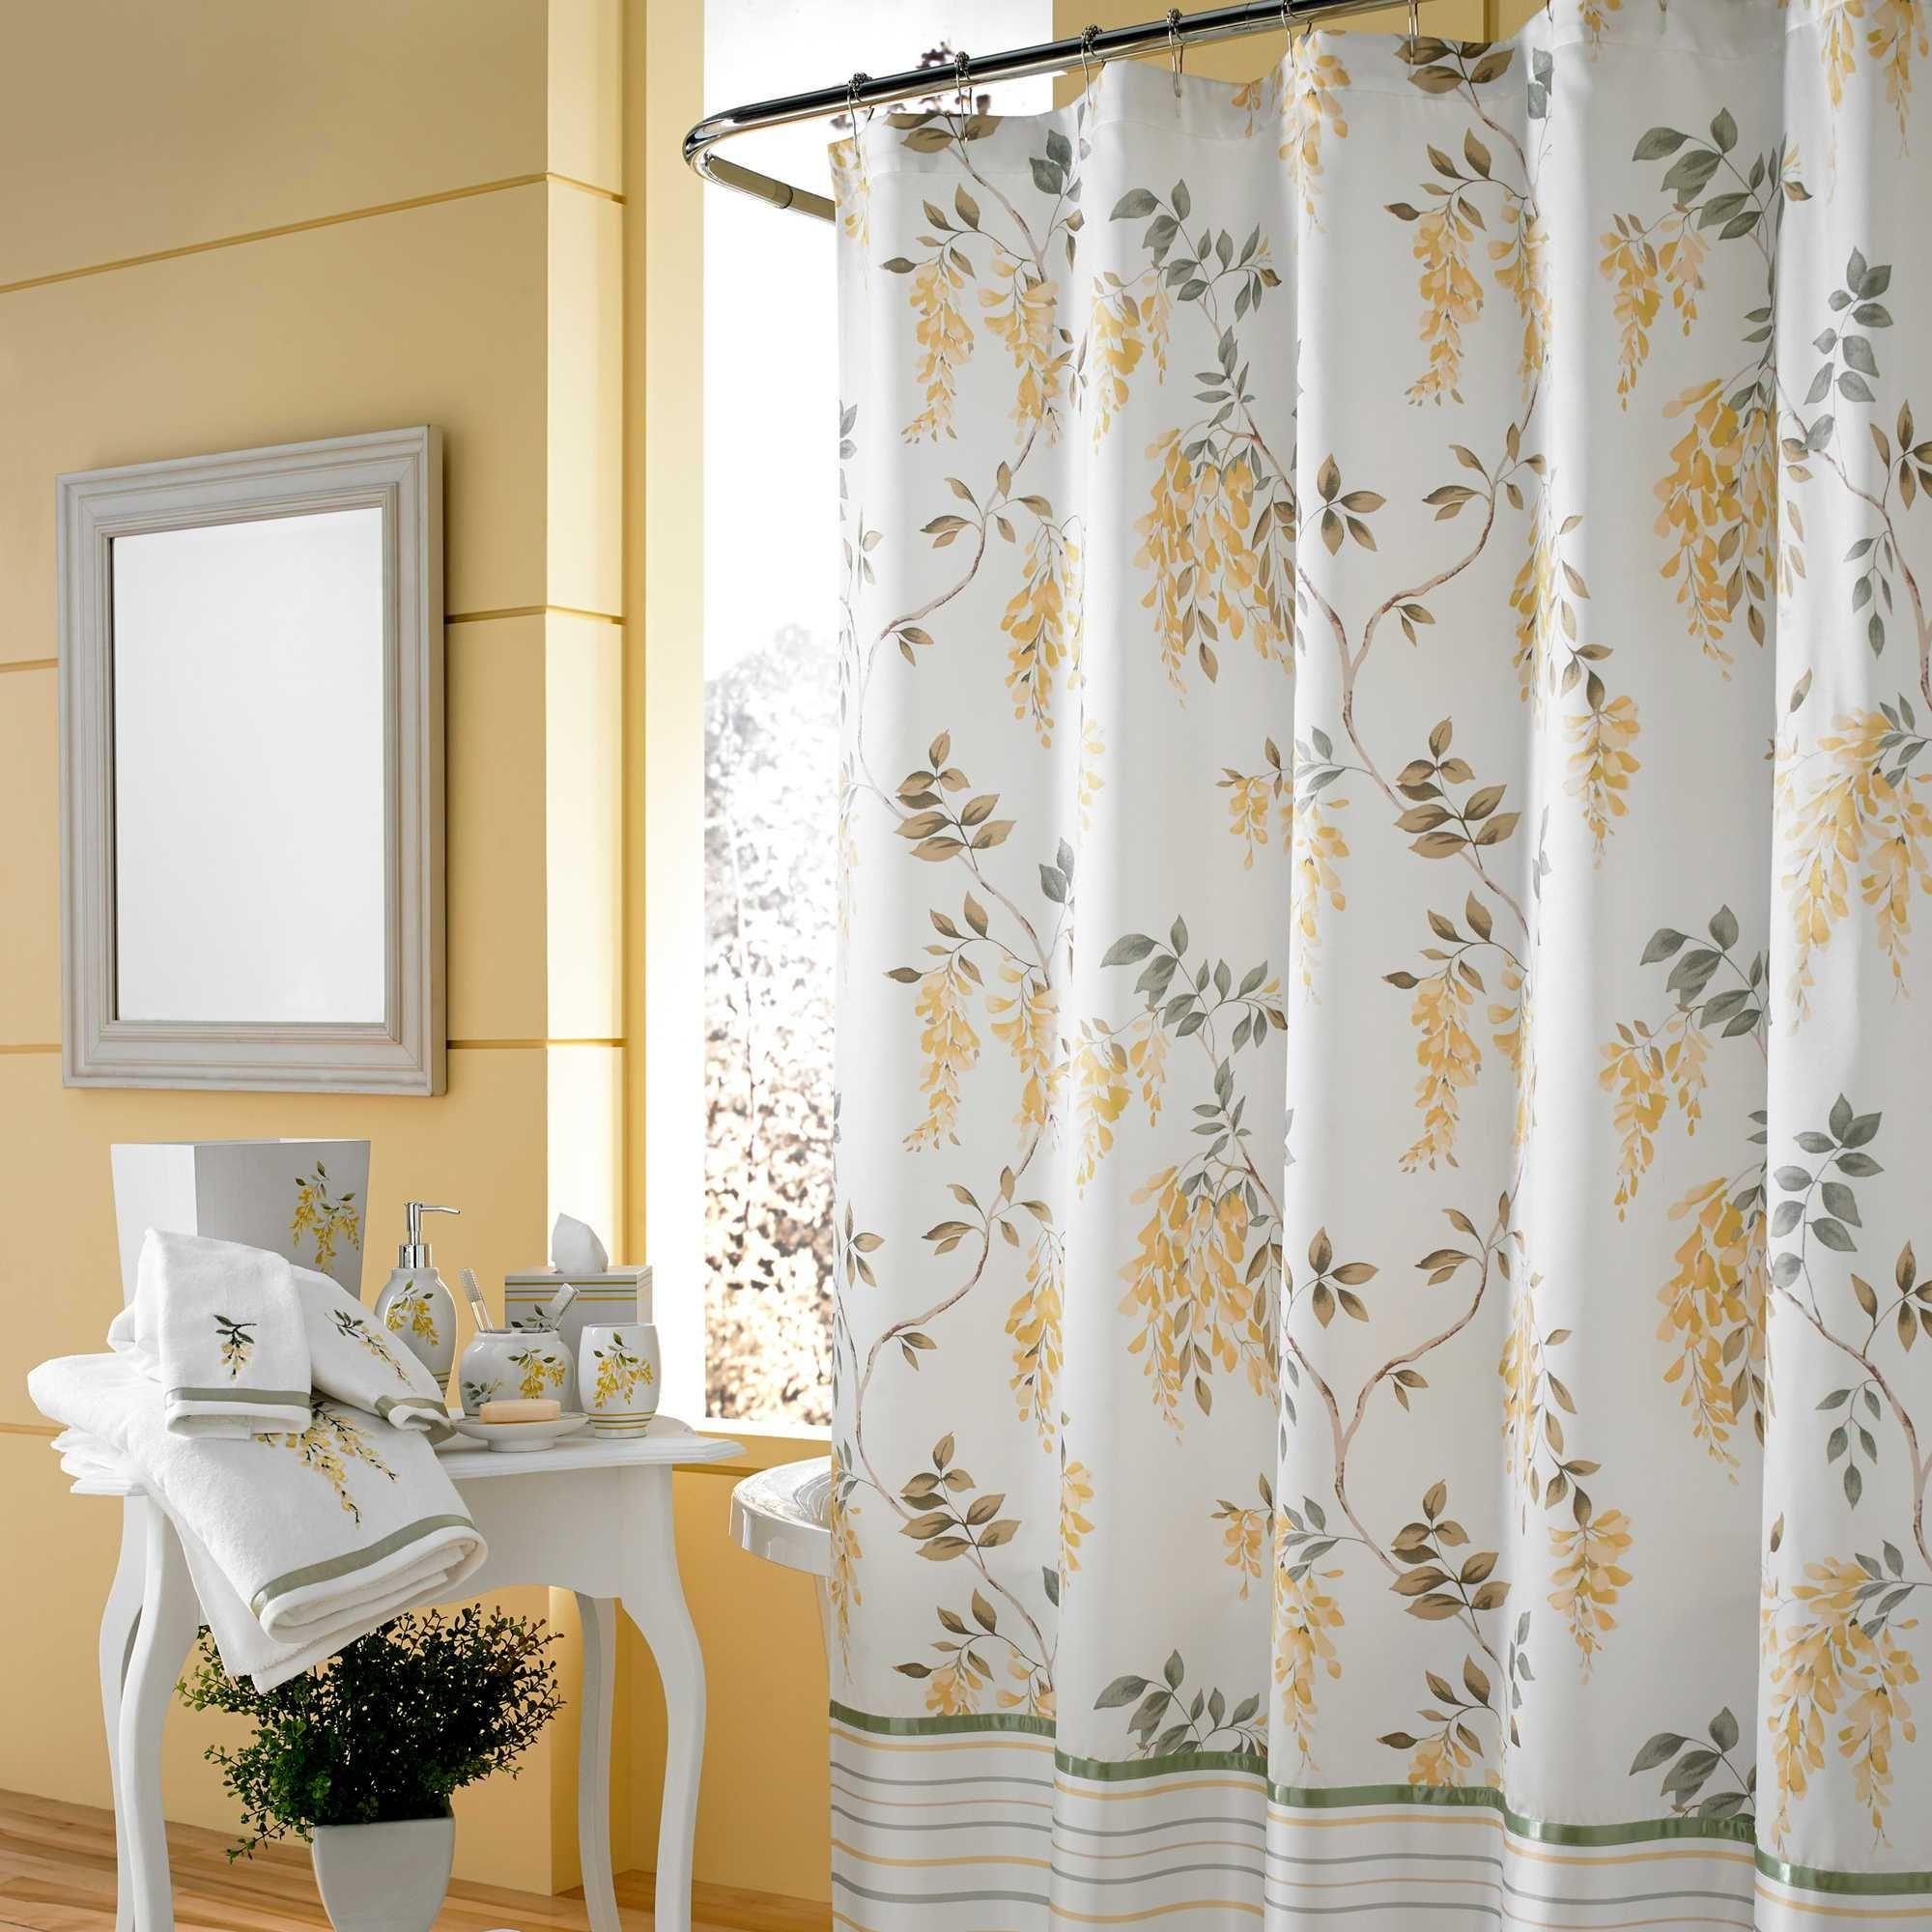 White Cape Cod Kitchen Curtains Httplatuluinfofeed - Cape cod kitchen curtains